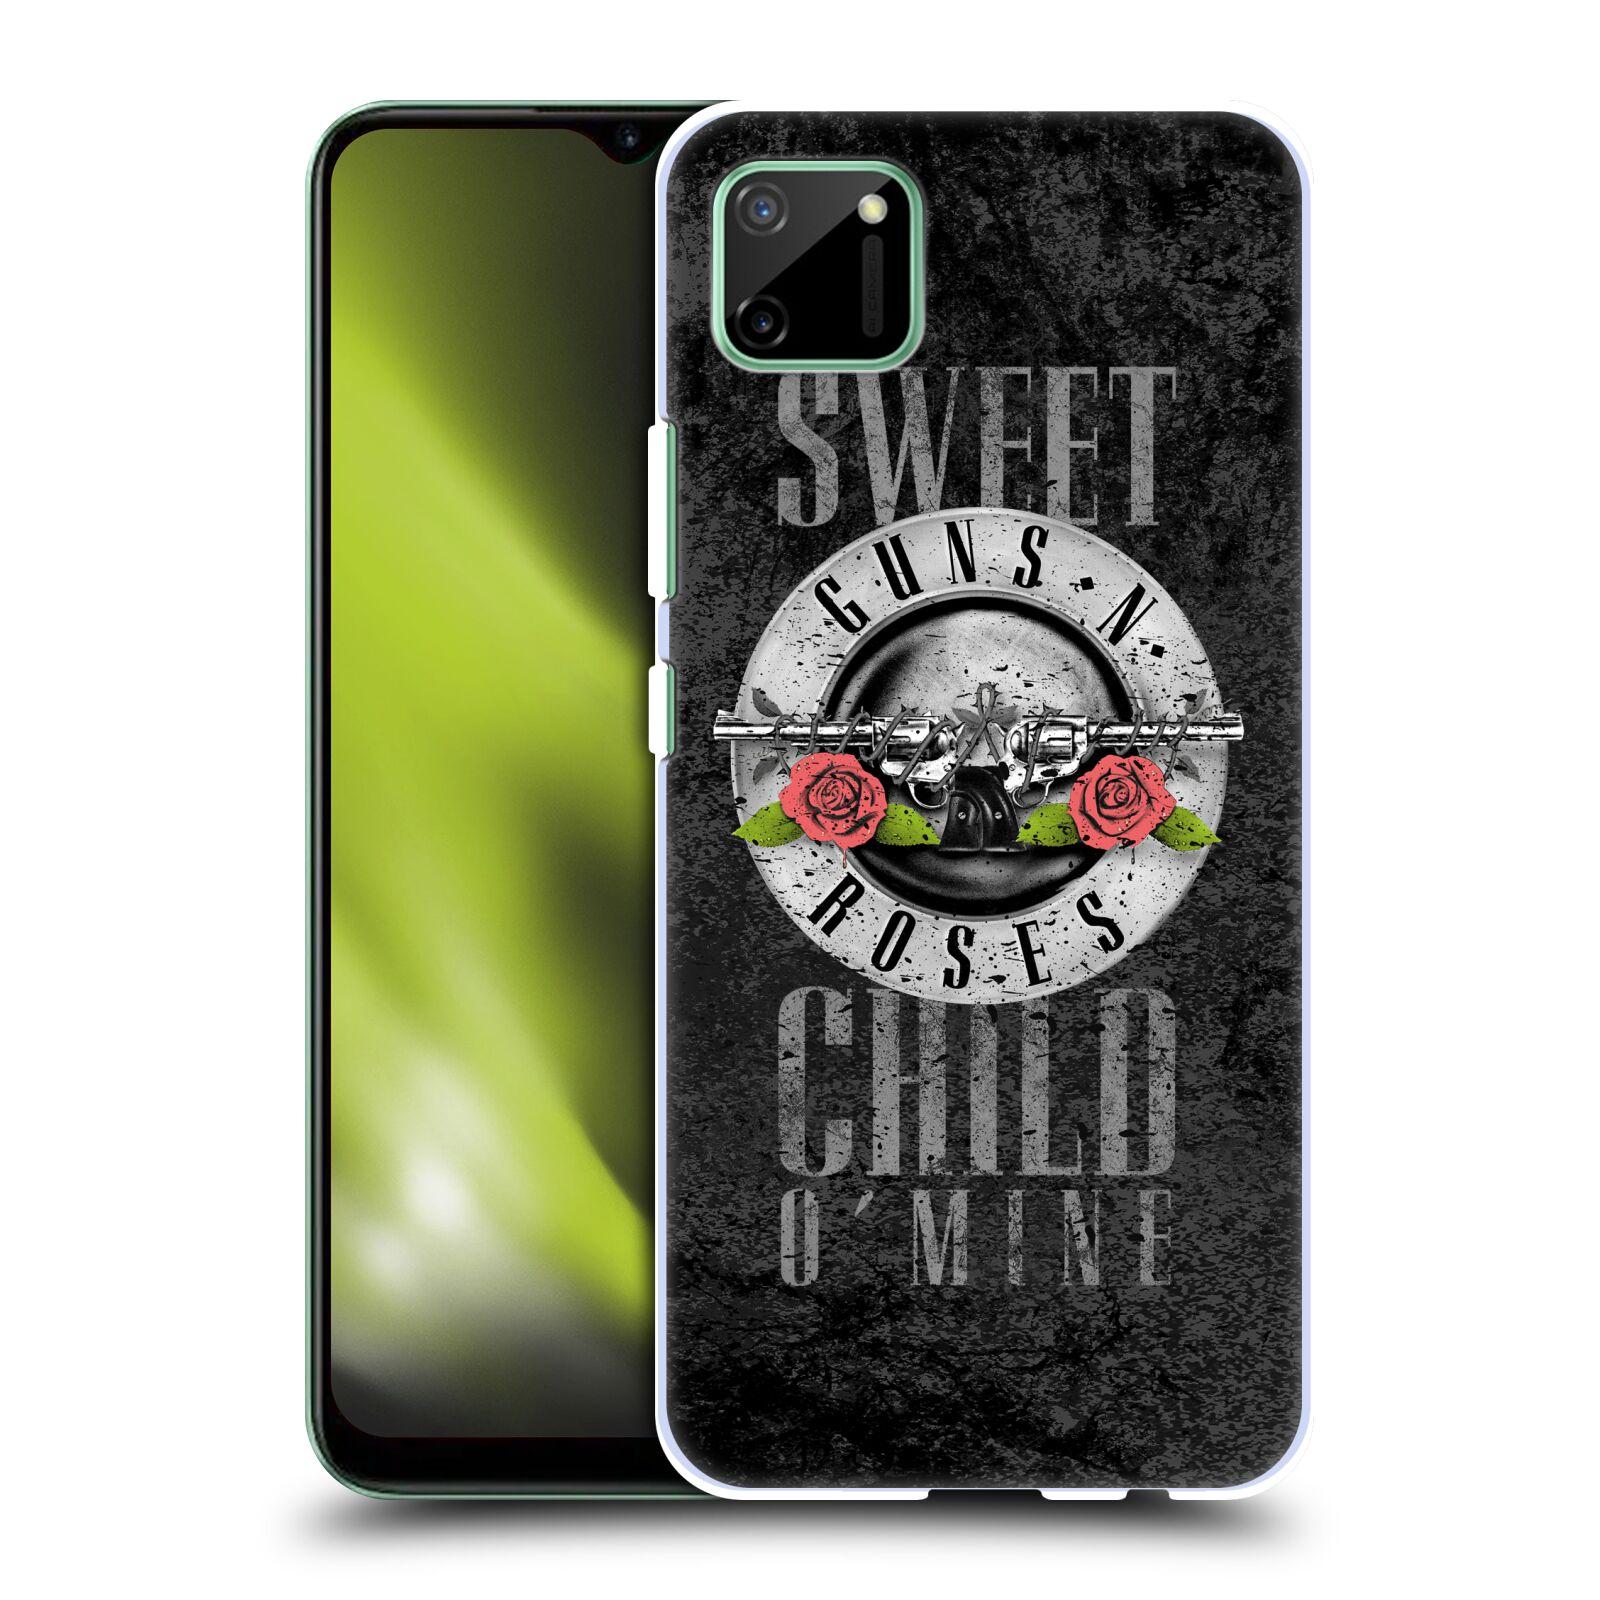 Plastové pouzdro na mobil Realme C11 - Head Case - Guns N' Roses - Sweet Child